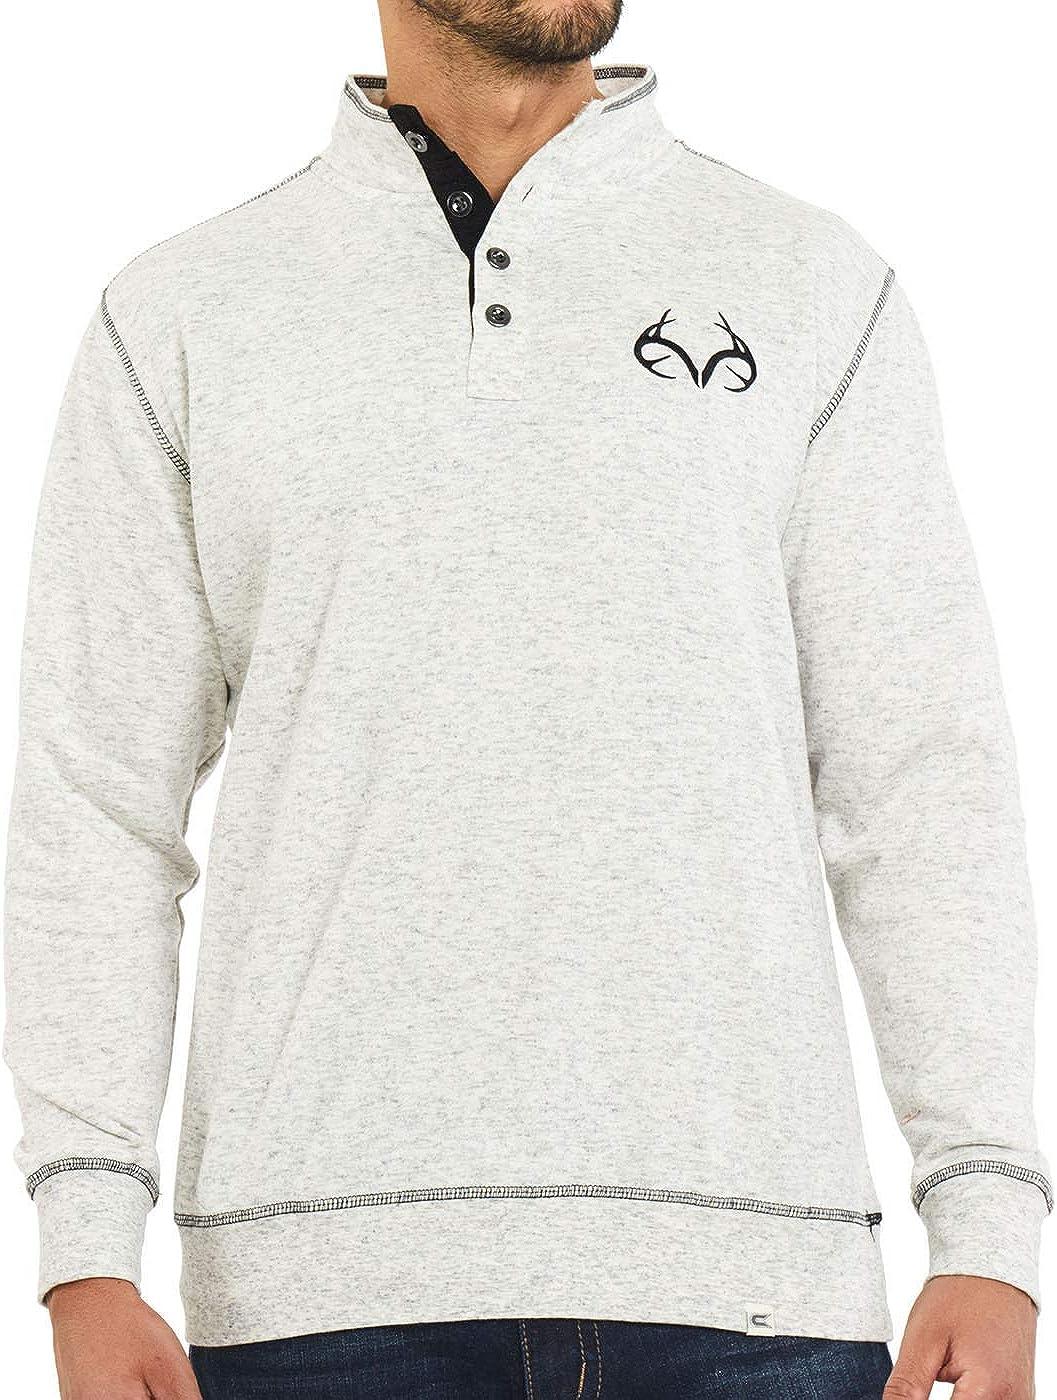 Realtree Men's 1/4 Zip White Edge Camo Pullover Fleece Sweater Jackets Quarter Zip (White Button Up, S)